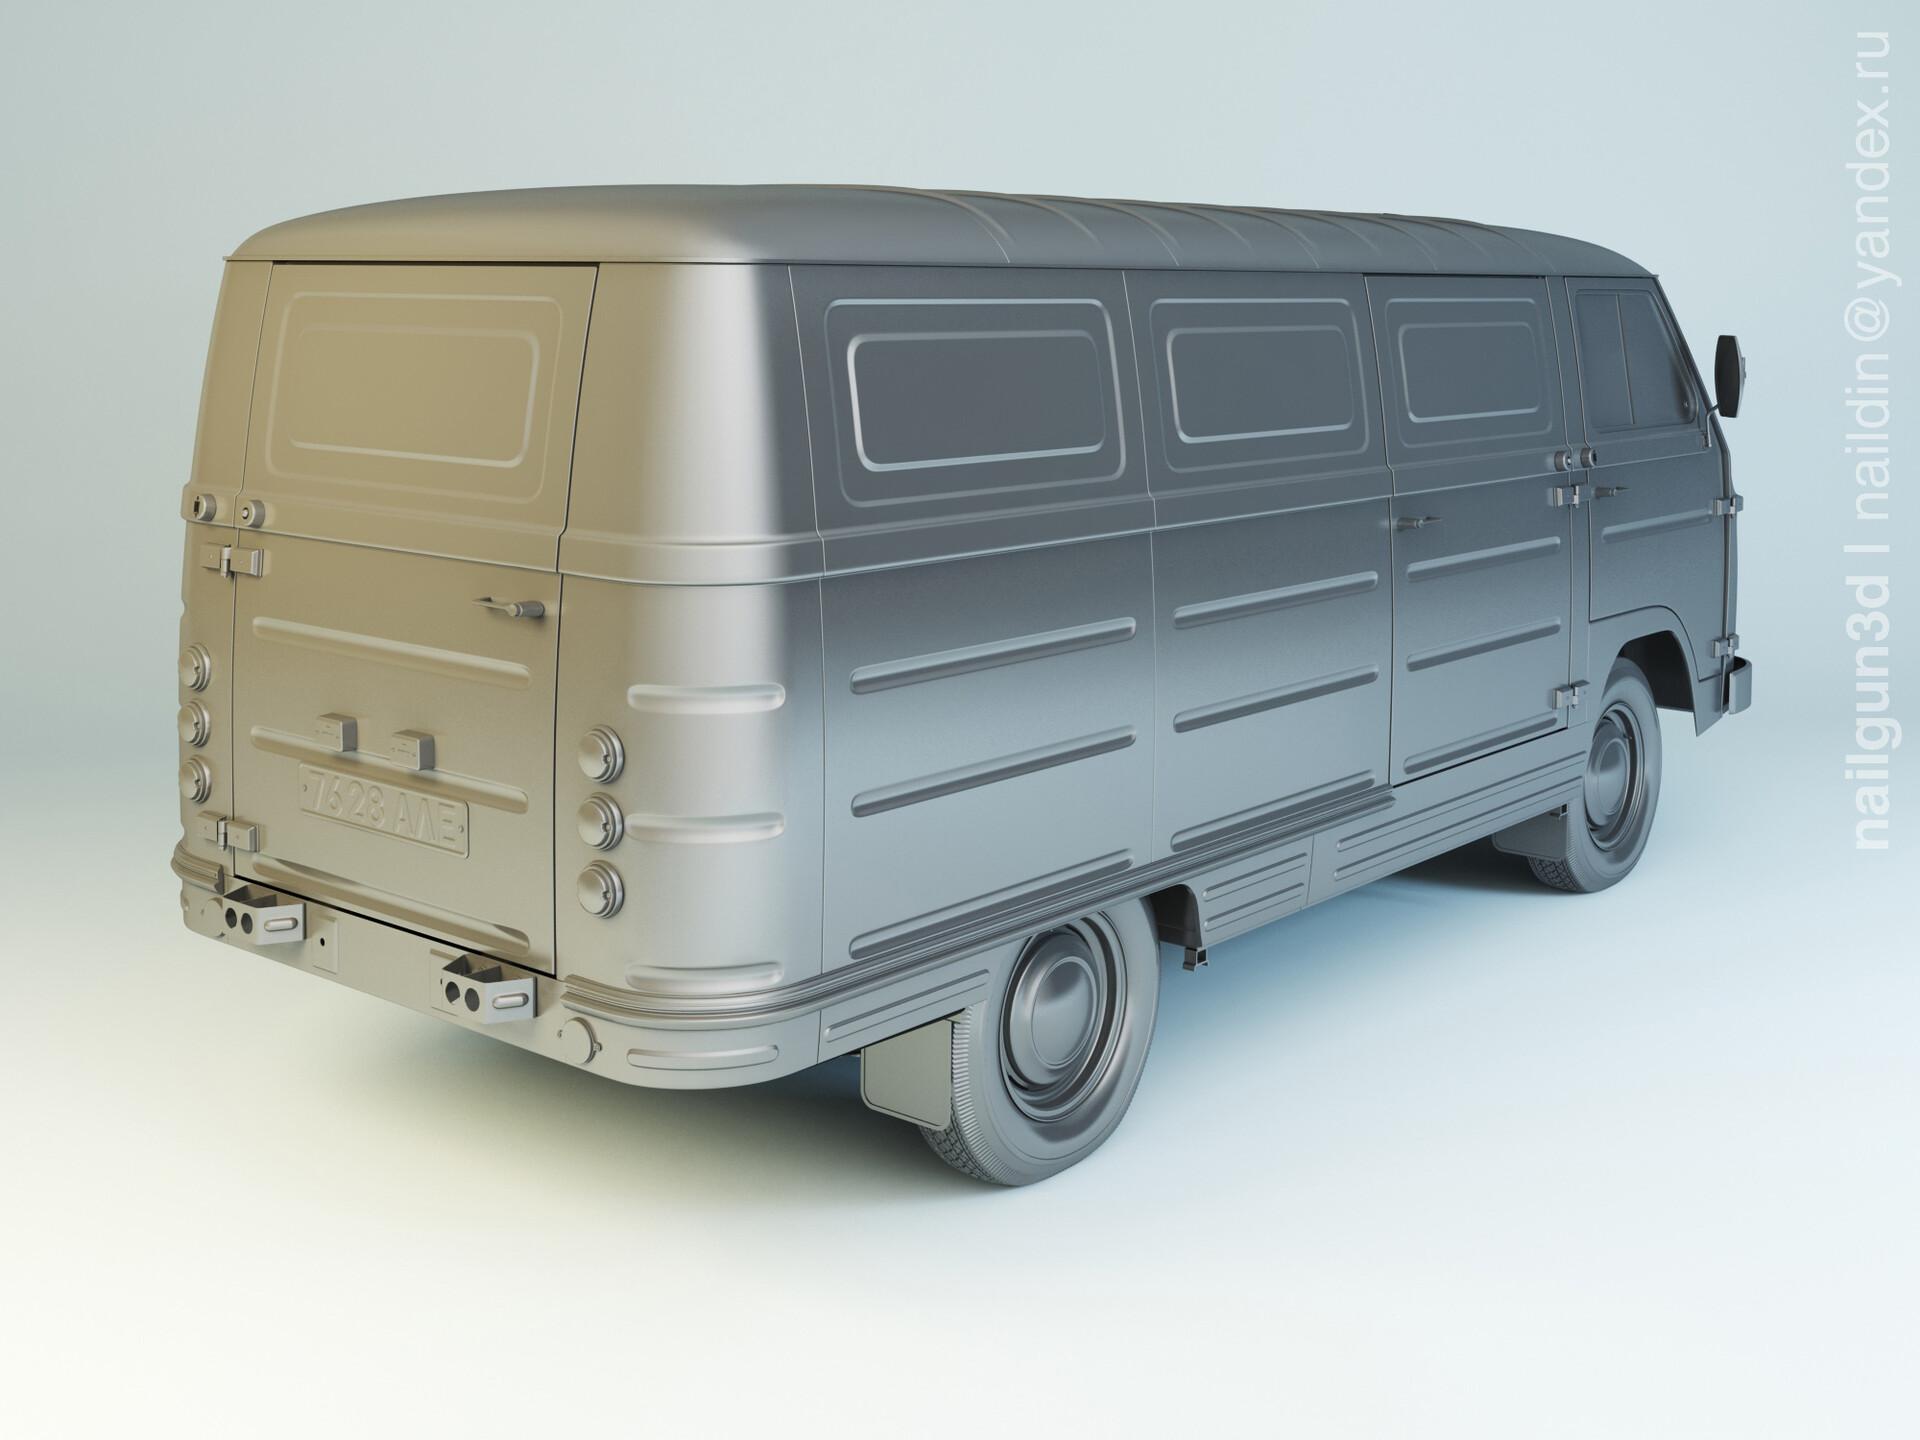 Nail khusnutdinov als 241 003 eraz 762b modelling 1